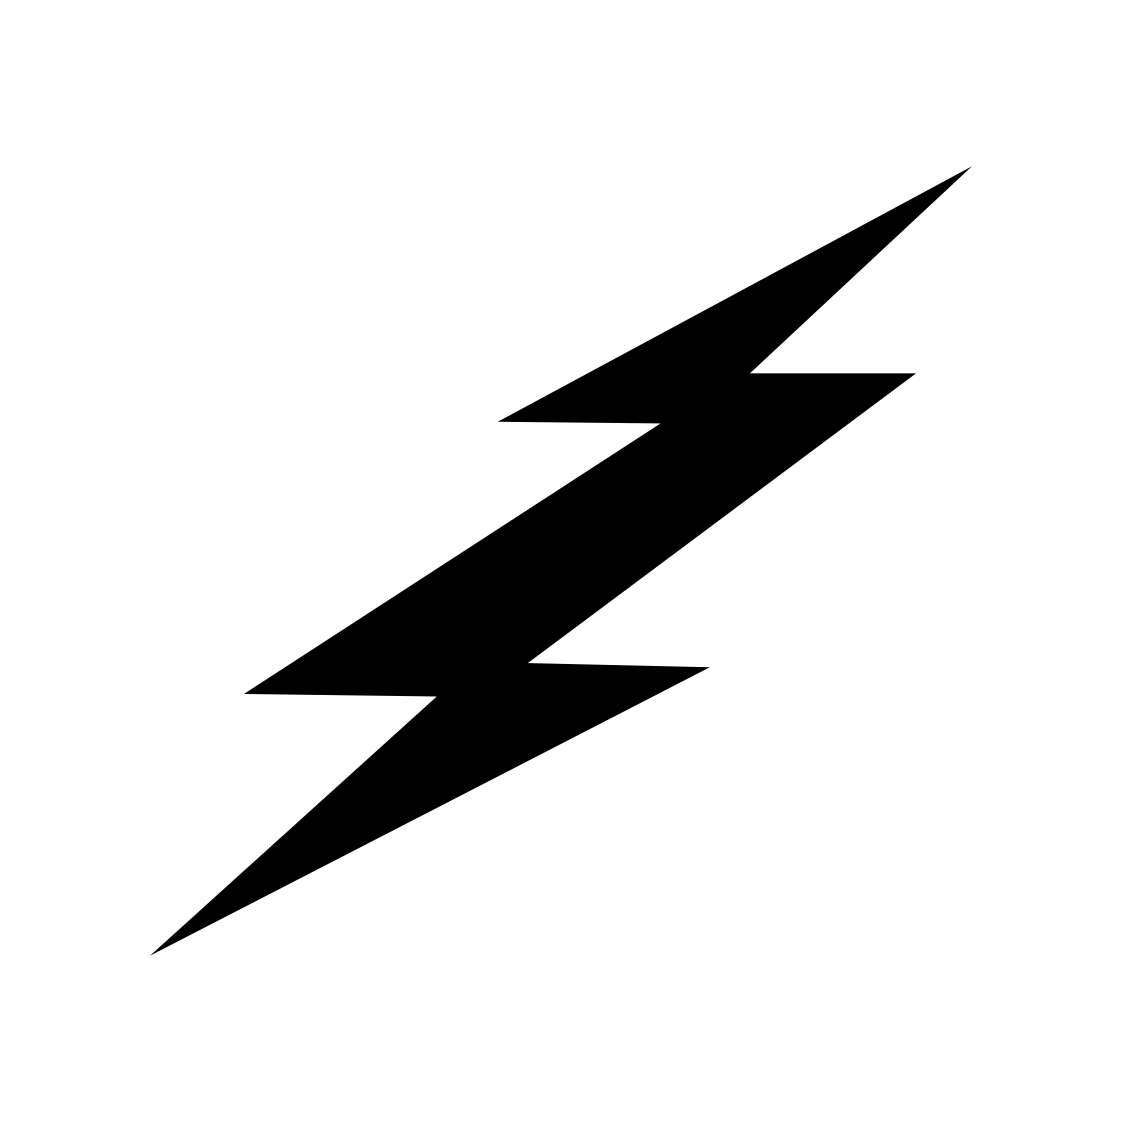 1122x1122 Streamer Lightning Bolt Clipart, Explore Pictures